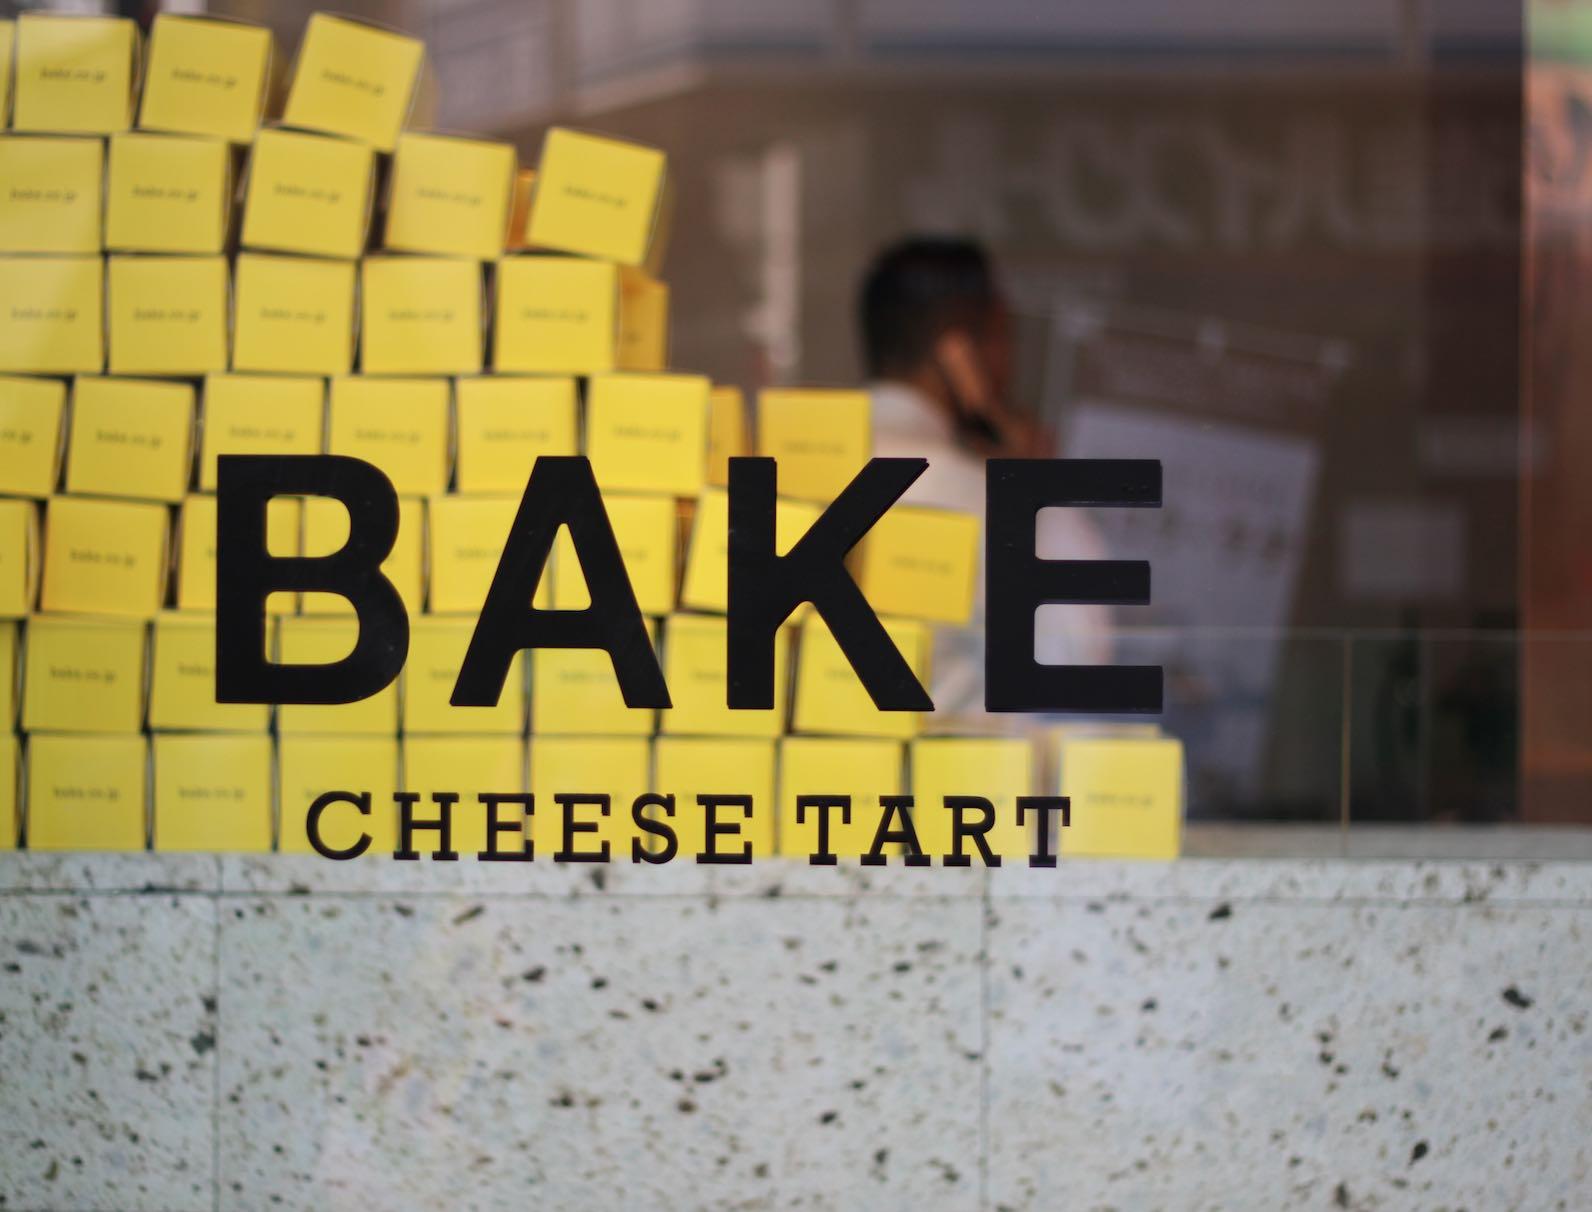 bake-cheese-tart-westgate-store-aspirantsg